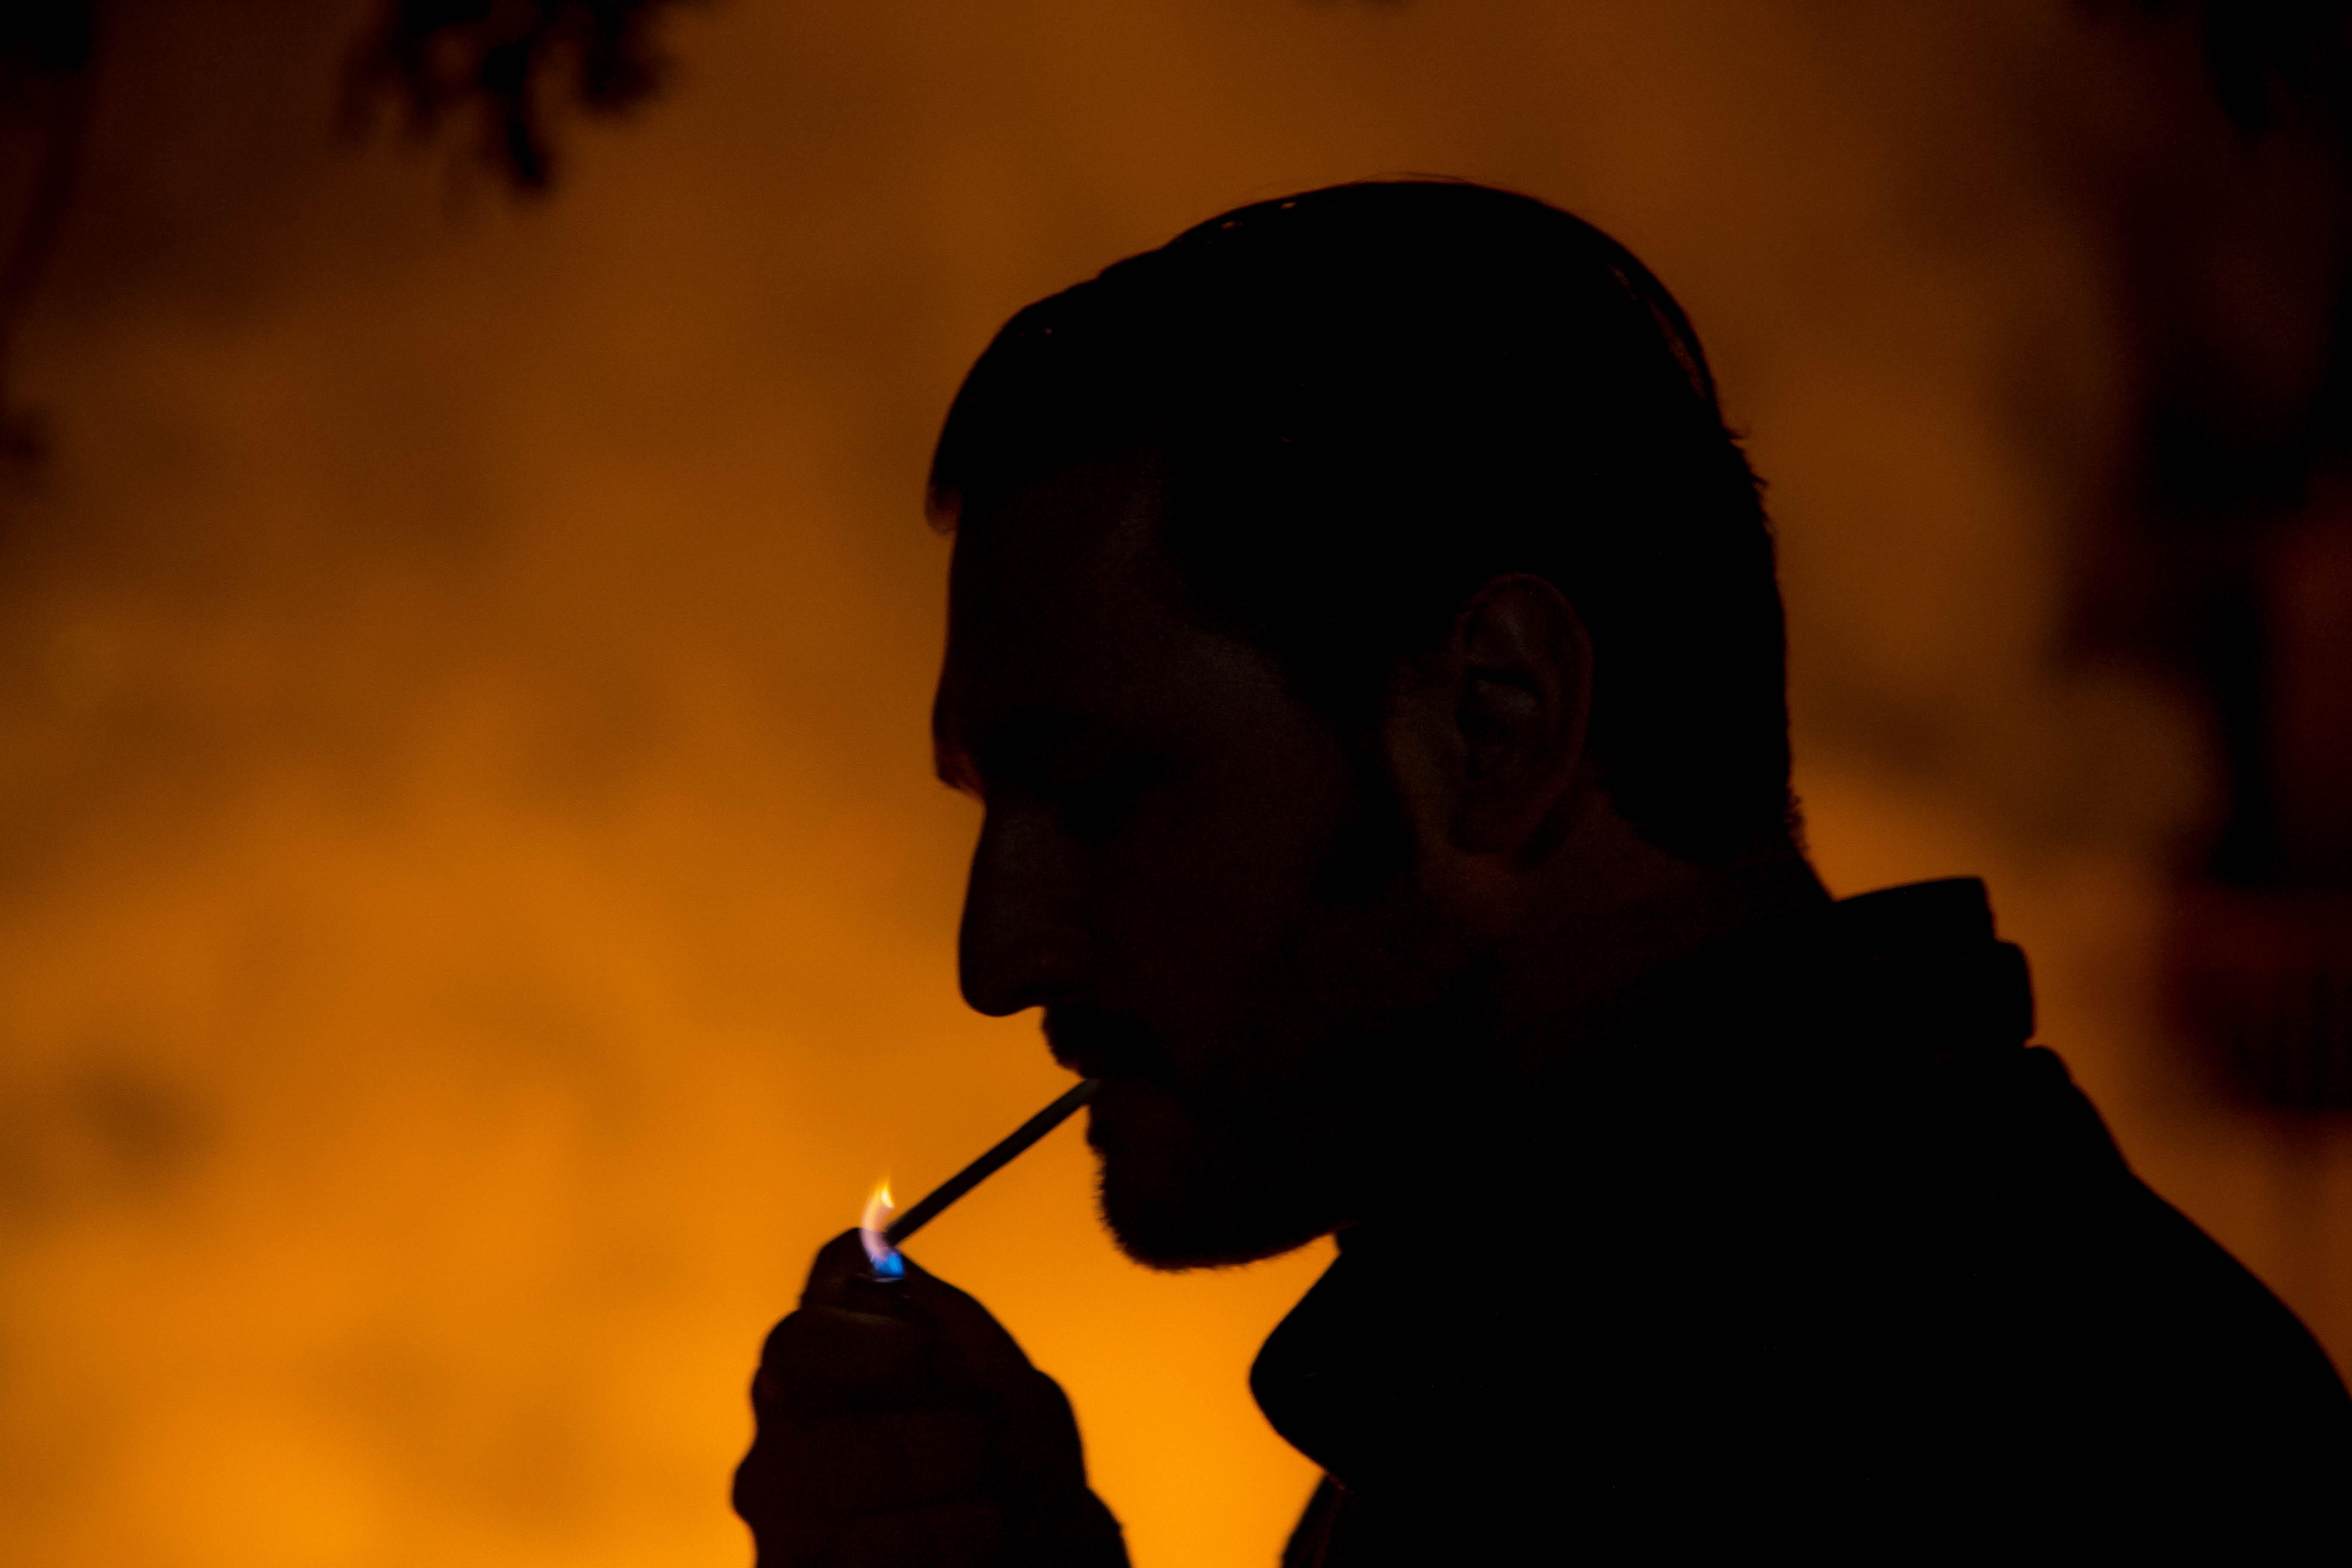 Portrait Night Sky Silhouette Smoke Music Smoking Yellow Evening Fire Orange Backlighting Lighter Marlboro Audio Light